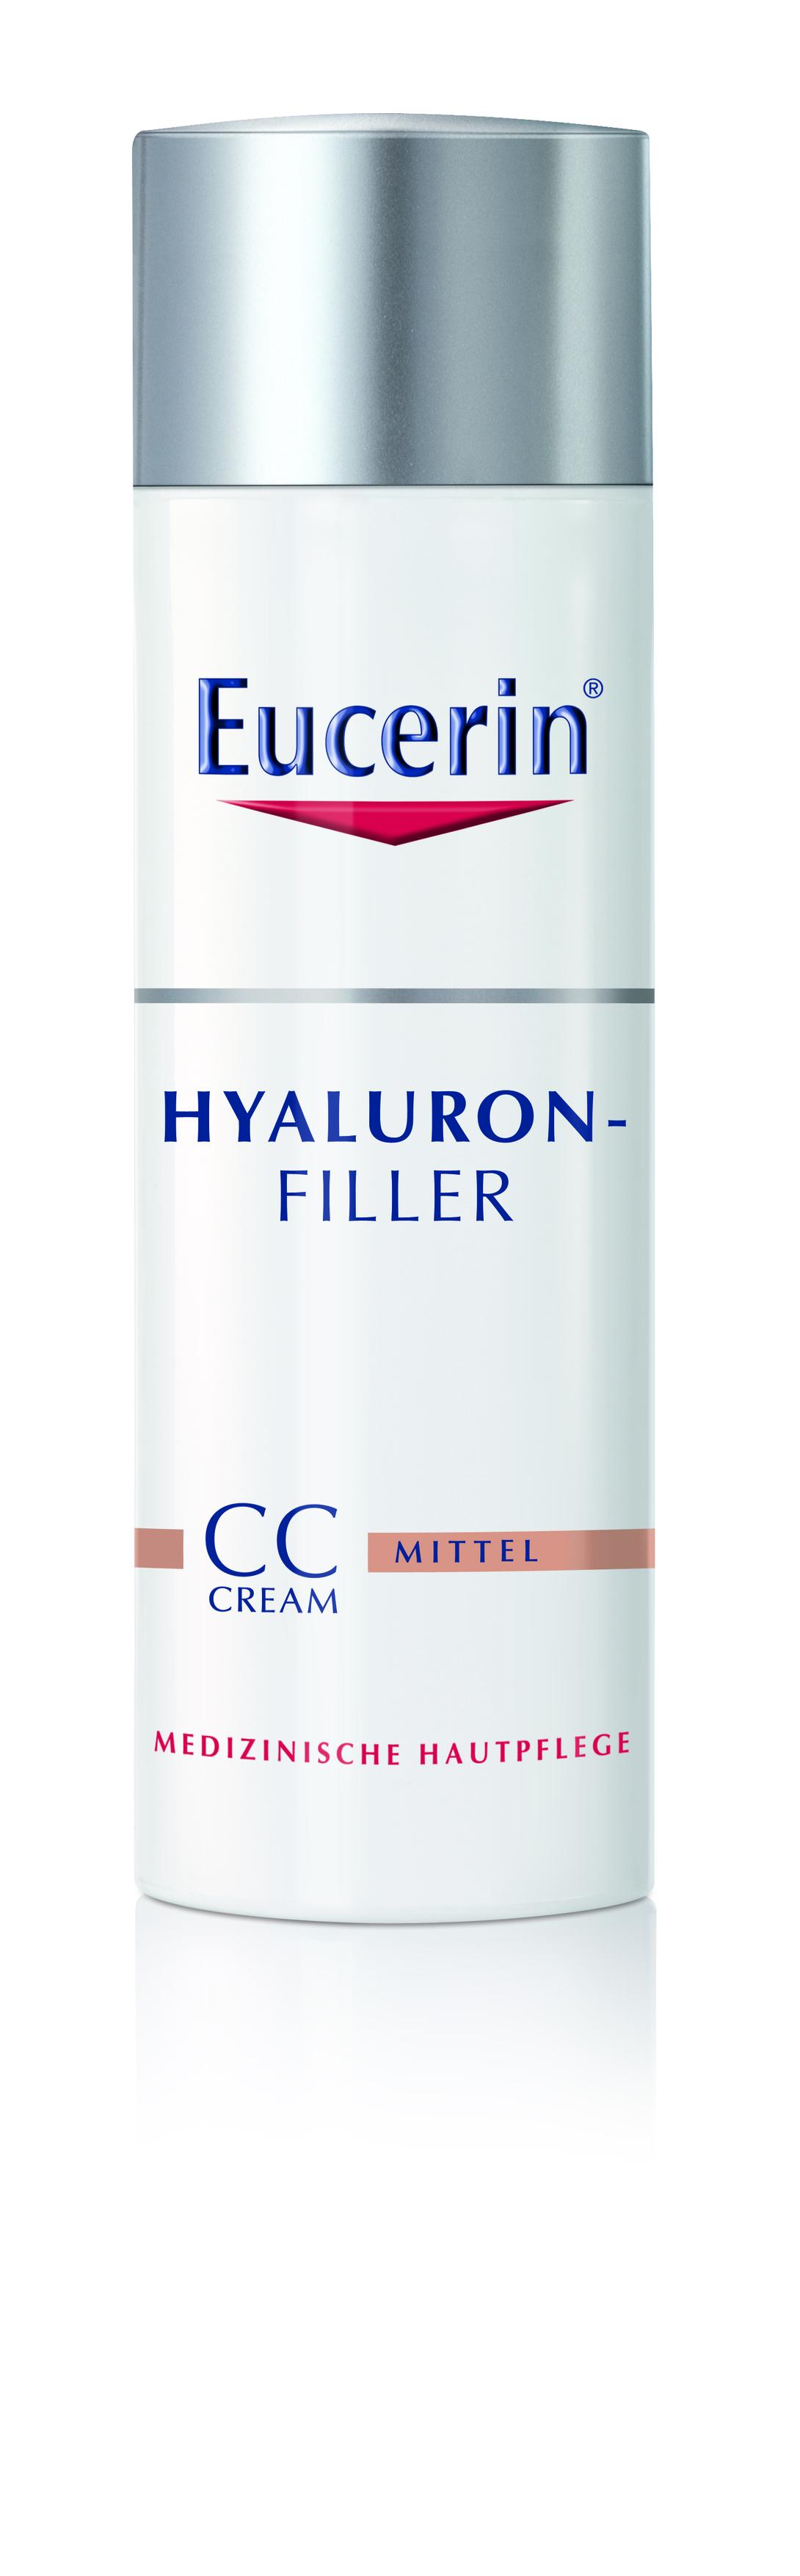 hyaluron-filler-cc-medium.jpg